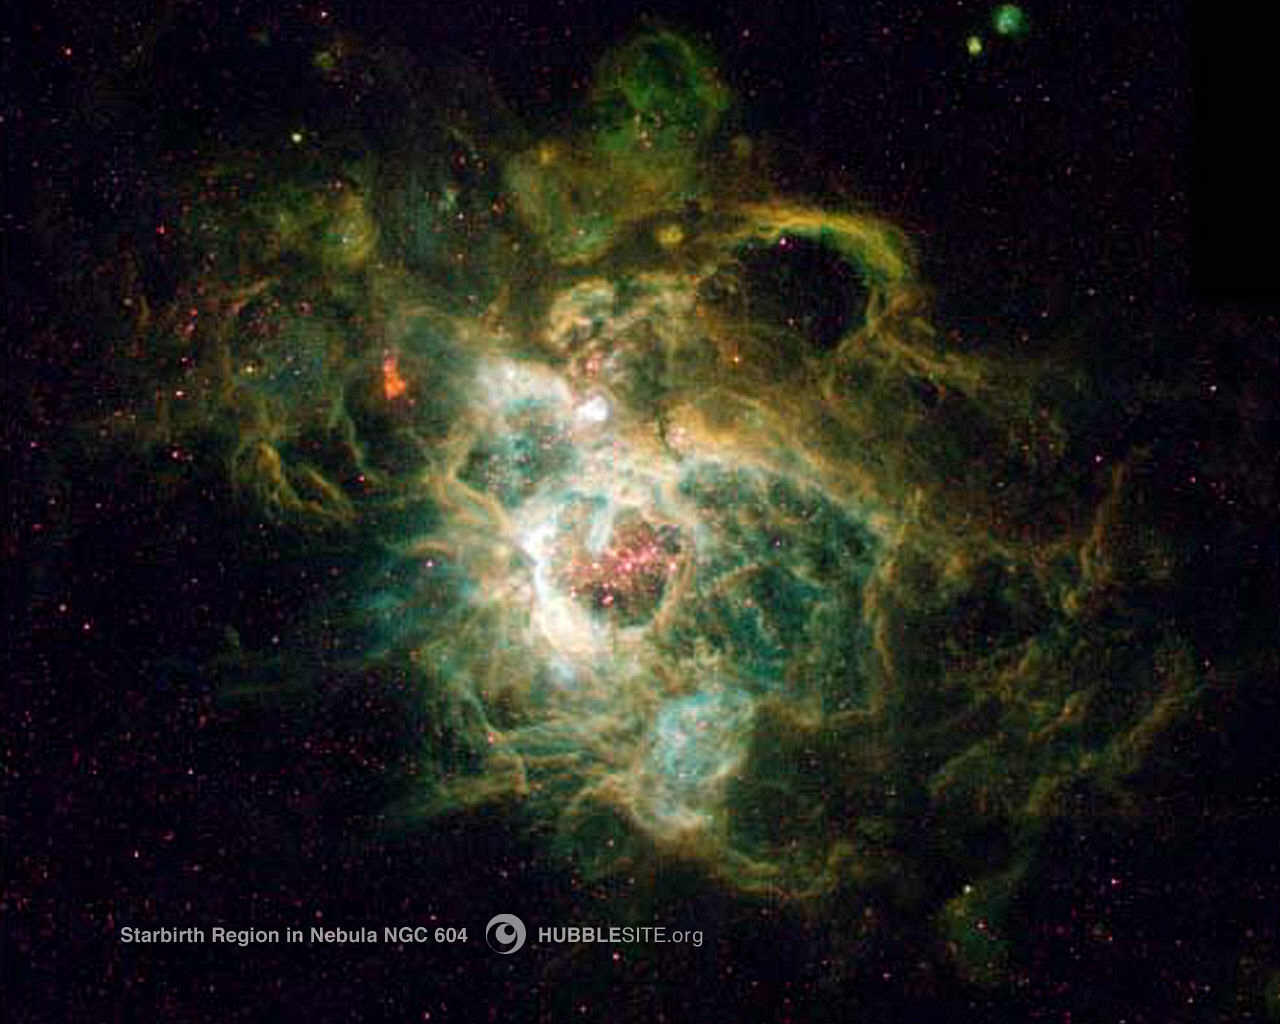 Teleskop astronomi fizik astronomi genel bilgiler fen bİlgİsİ